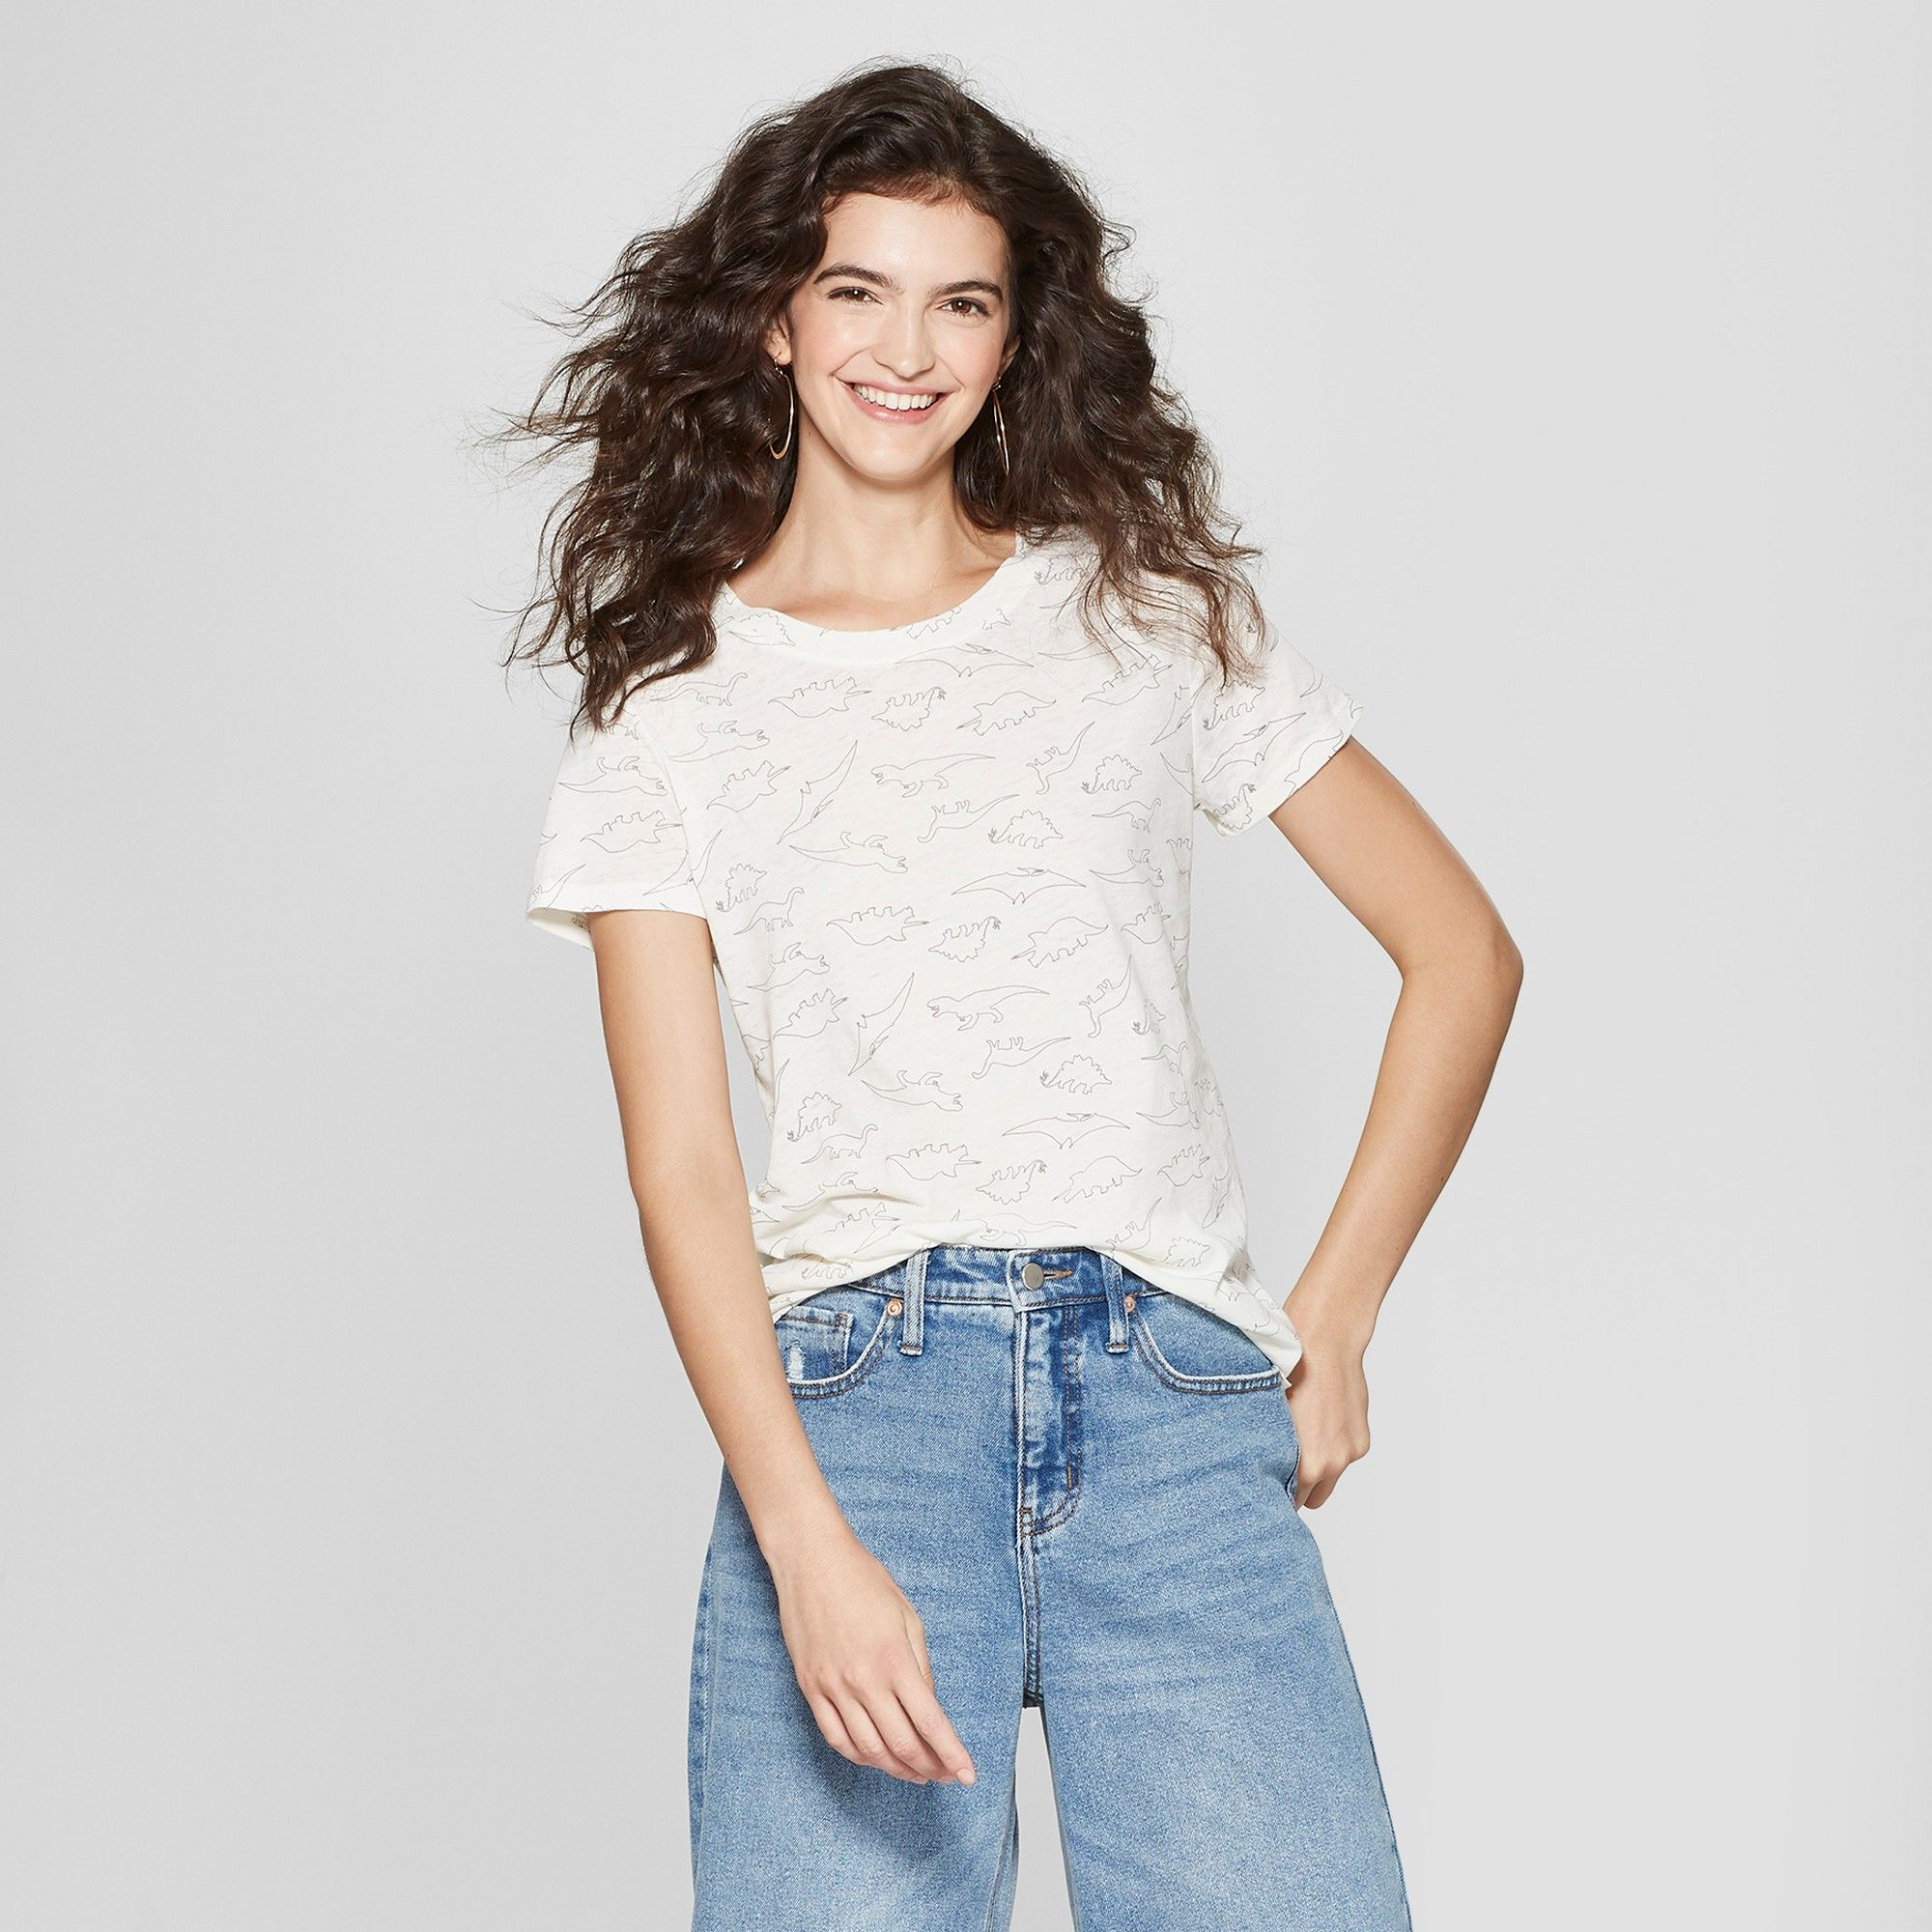 e5dda0e9 Women's Short Sleeve Dinosaur Outline Print T-Shirt - Zoe+Liv (Juniors')  Ivory Xxl, White